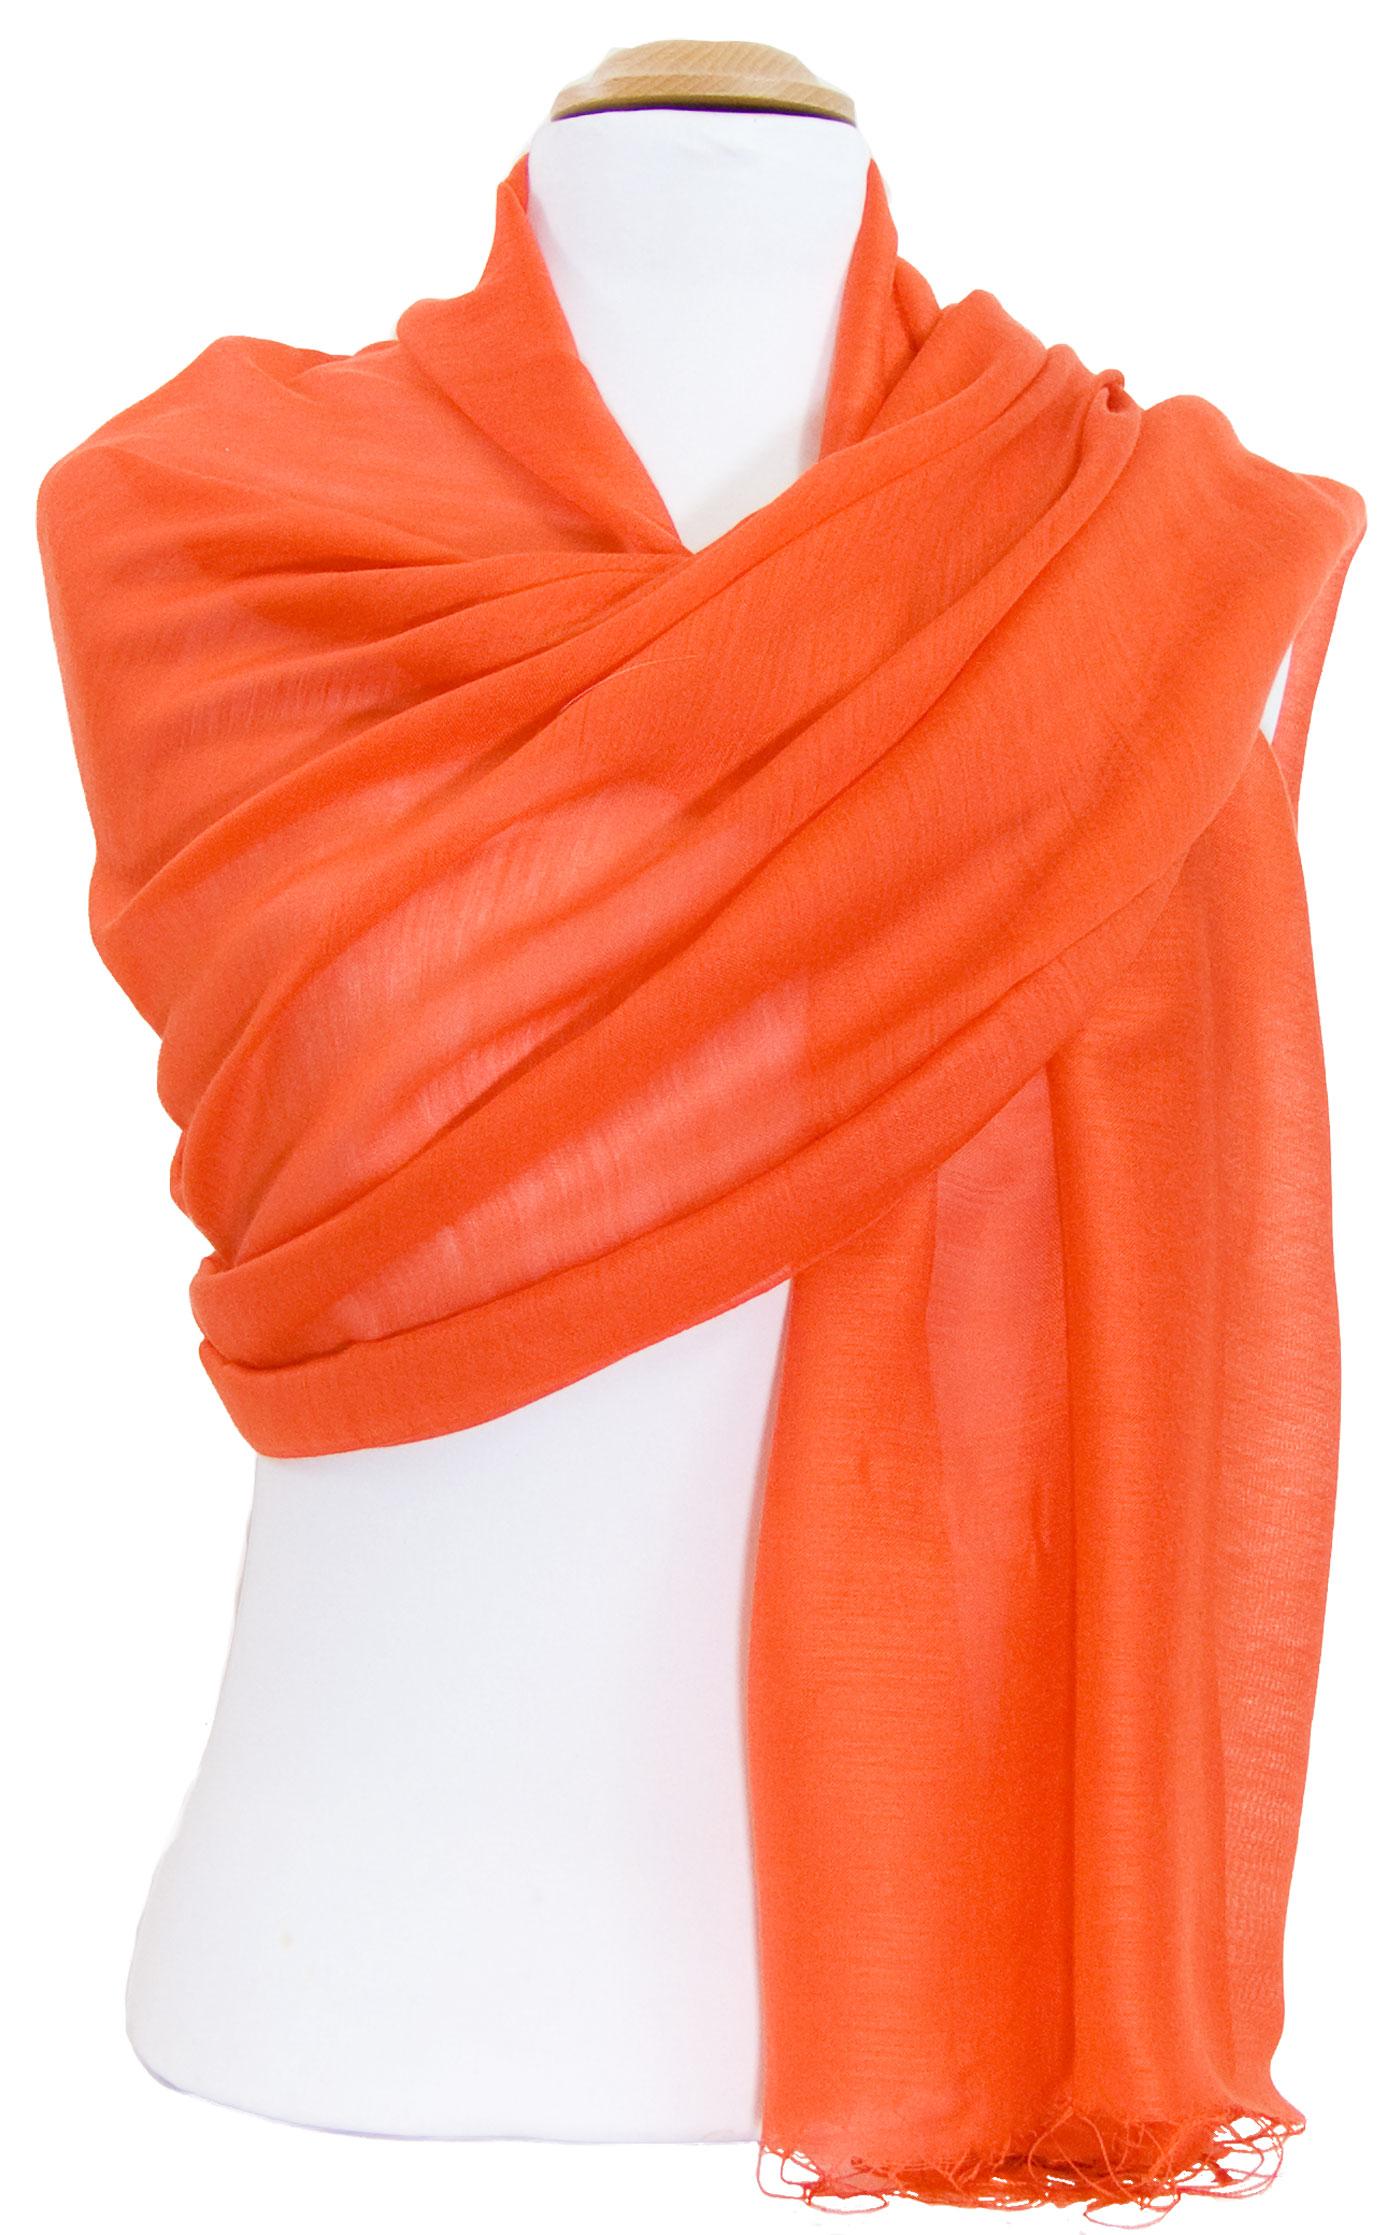 étole foulard orange soie fine Alex 2